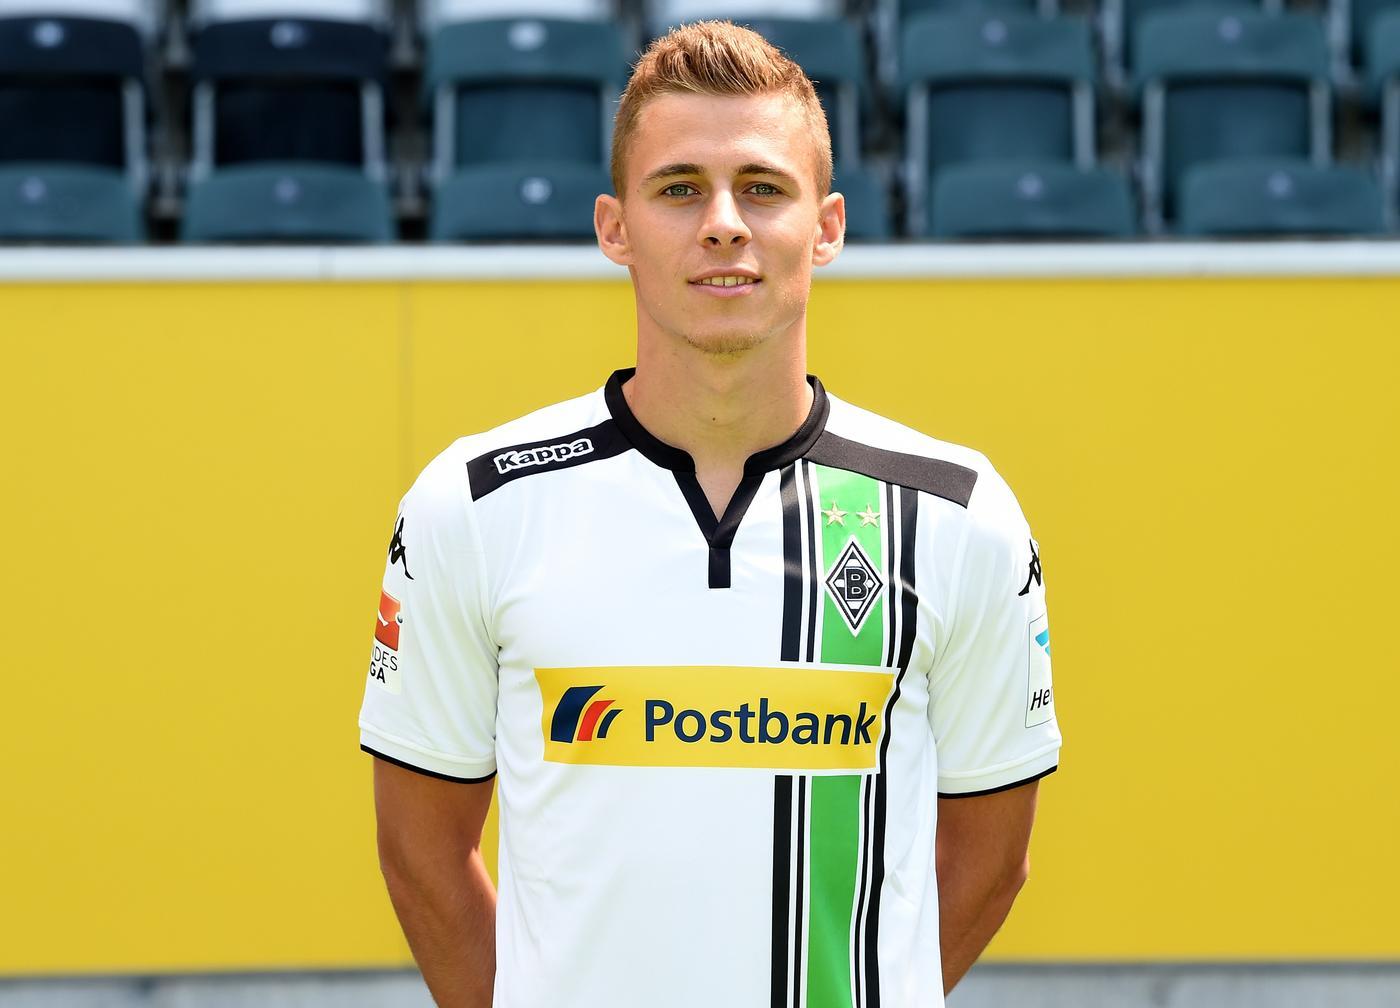 Tottenham Hotspur open transfer talks with Borussia Monchengladbach regarding Thorgan Hazard, he would like to be near his brother – report